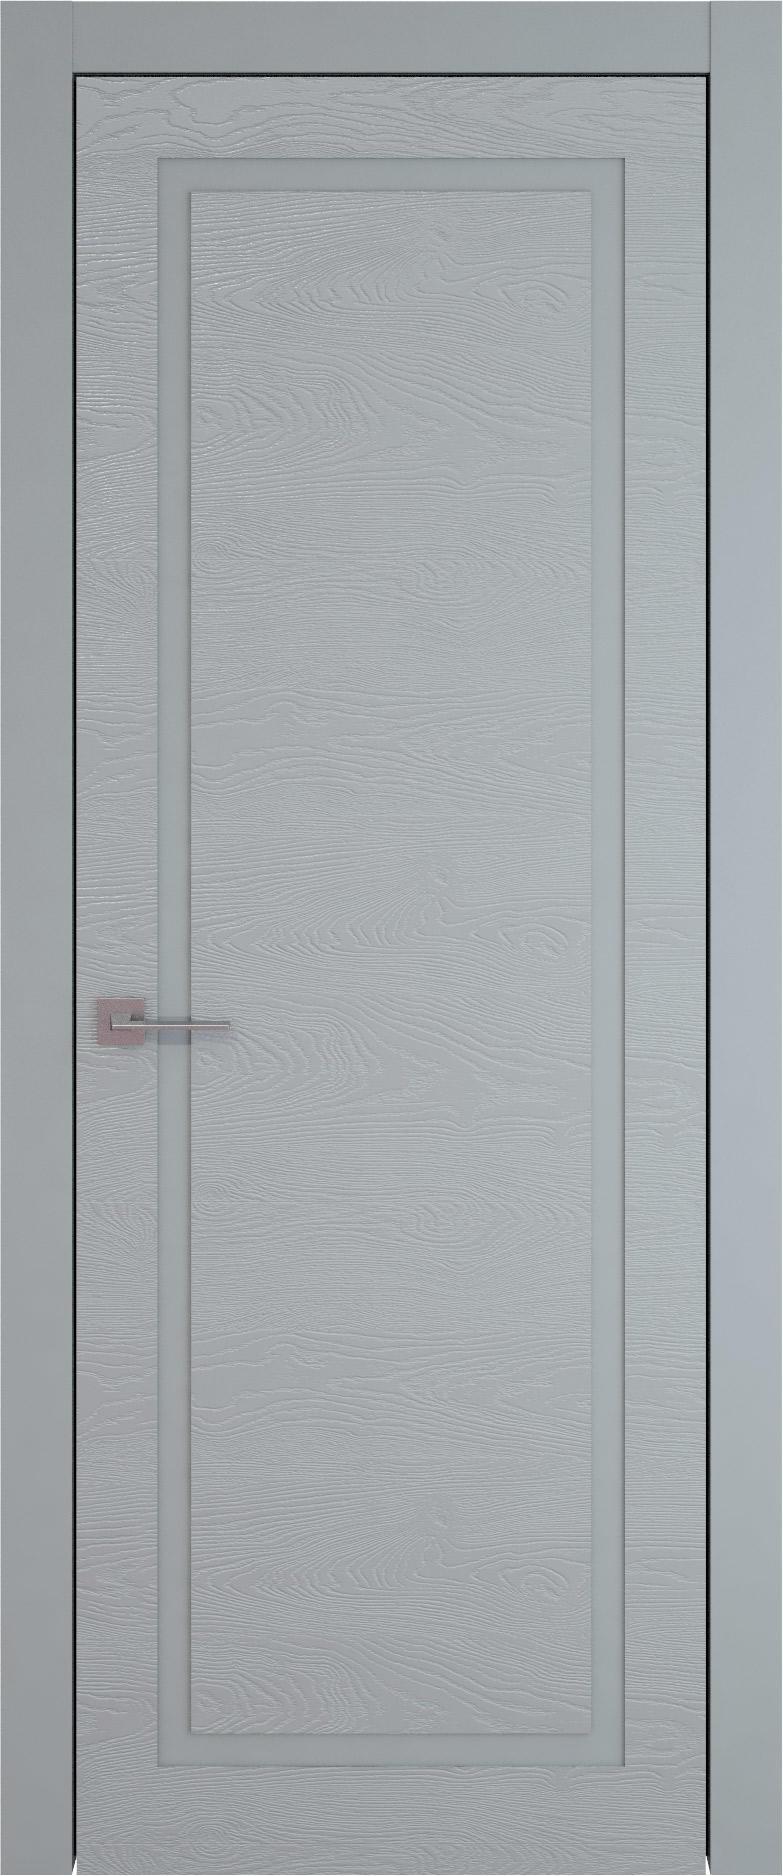 Tivoli Д-5 цвет - Серебристо-серая эмаль по шпону (RAL 7045) Без стекла (ДГ)